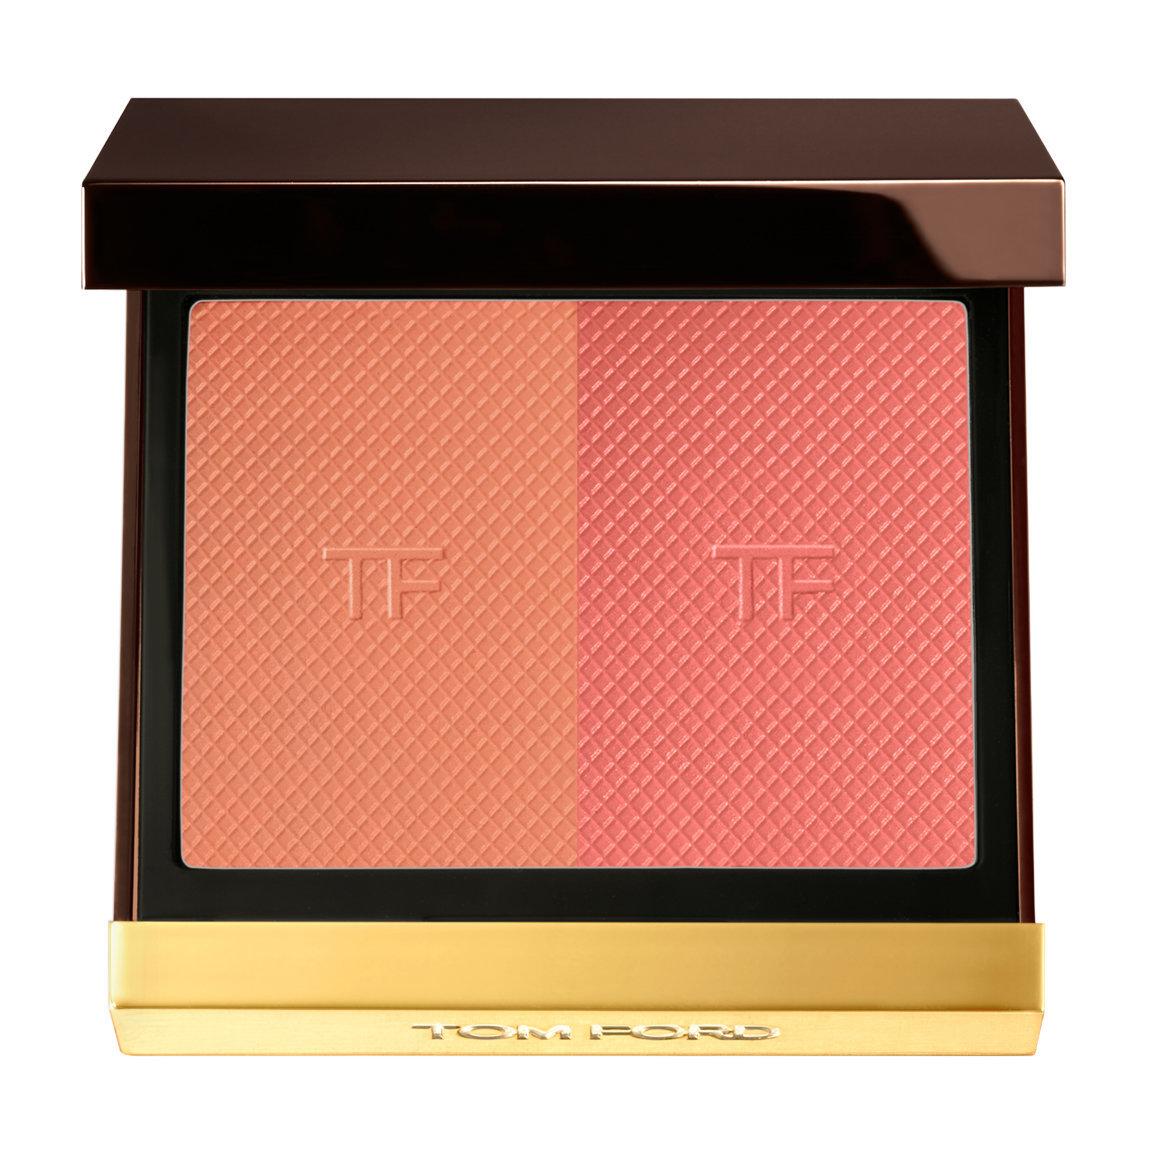 TOM FORD Shade & Illuminate Blush Cherry Blaze alternative view 1 - product swatch.